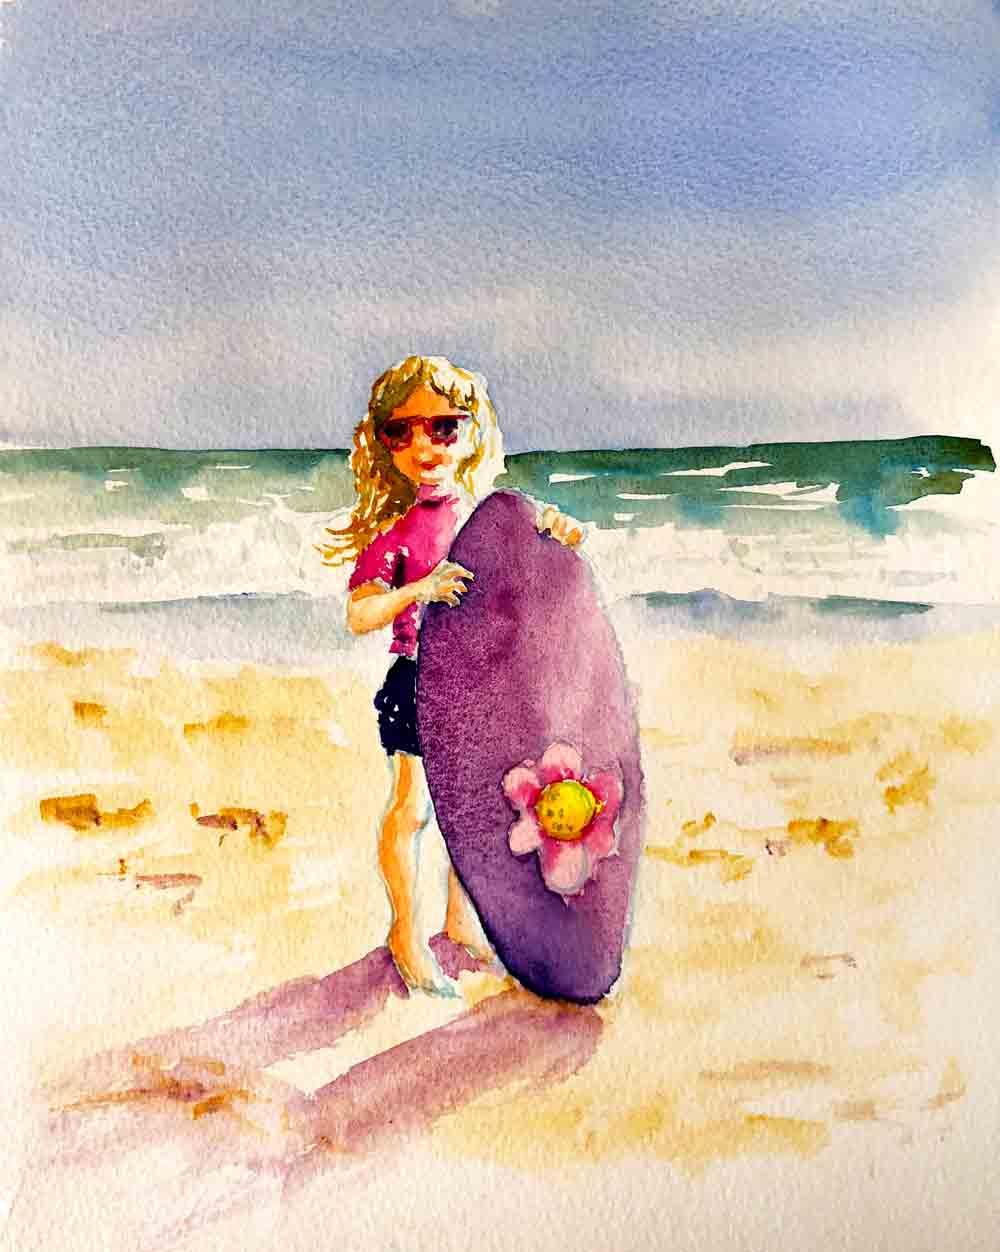 Watercolour-Kids-1-Surfer-Girl-photo-kw.jpg